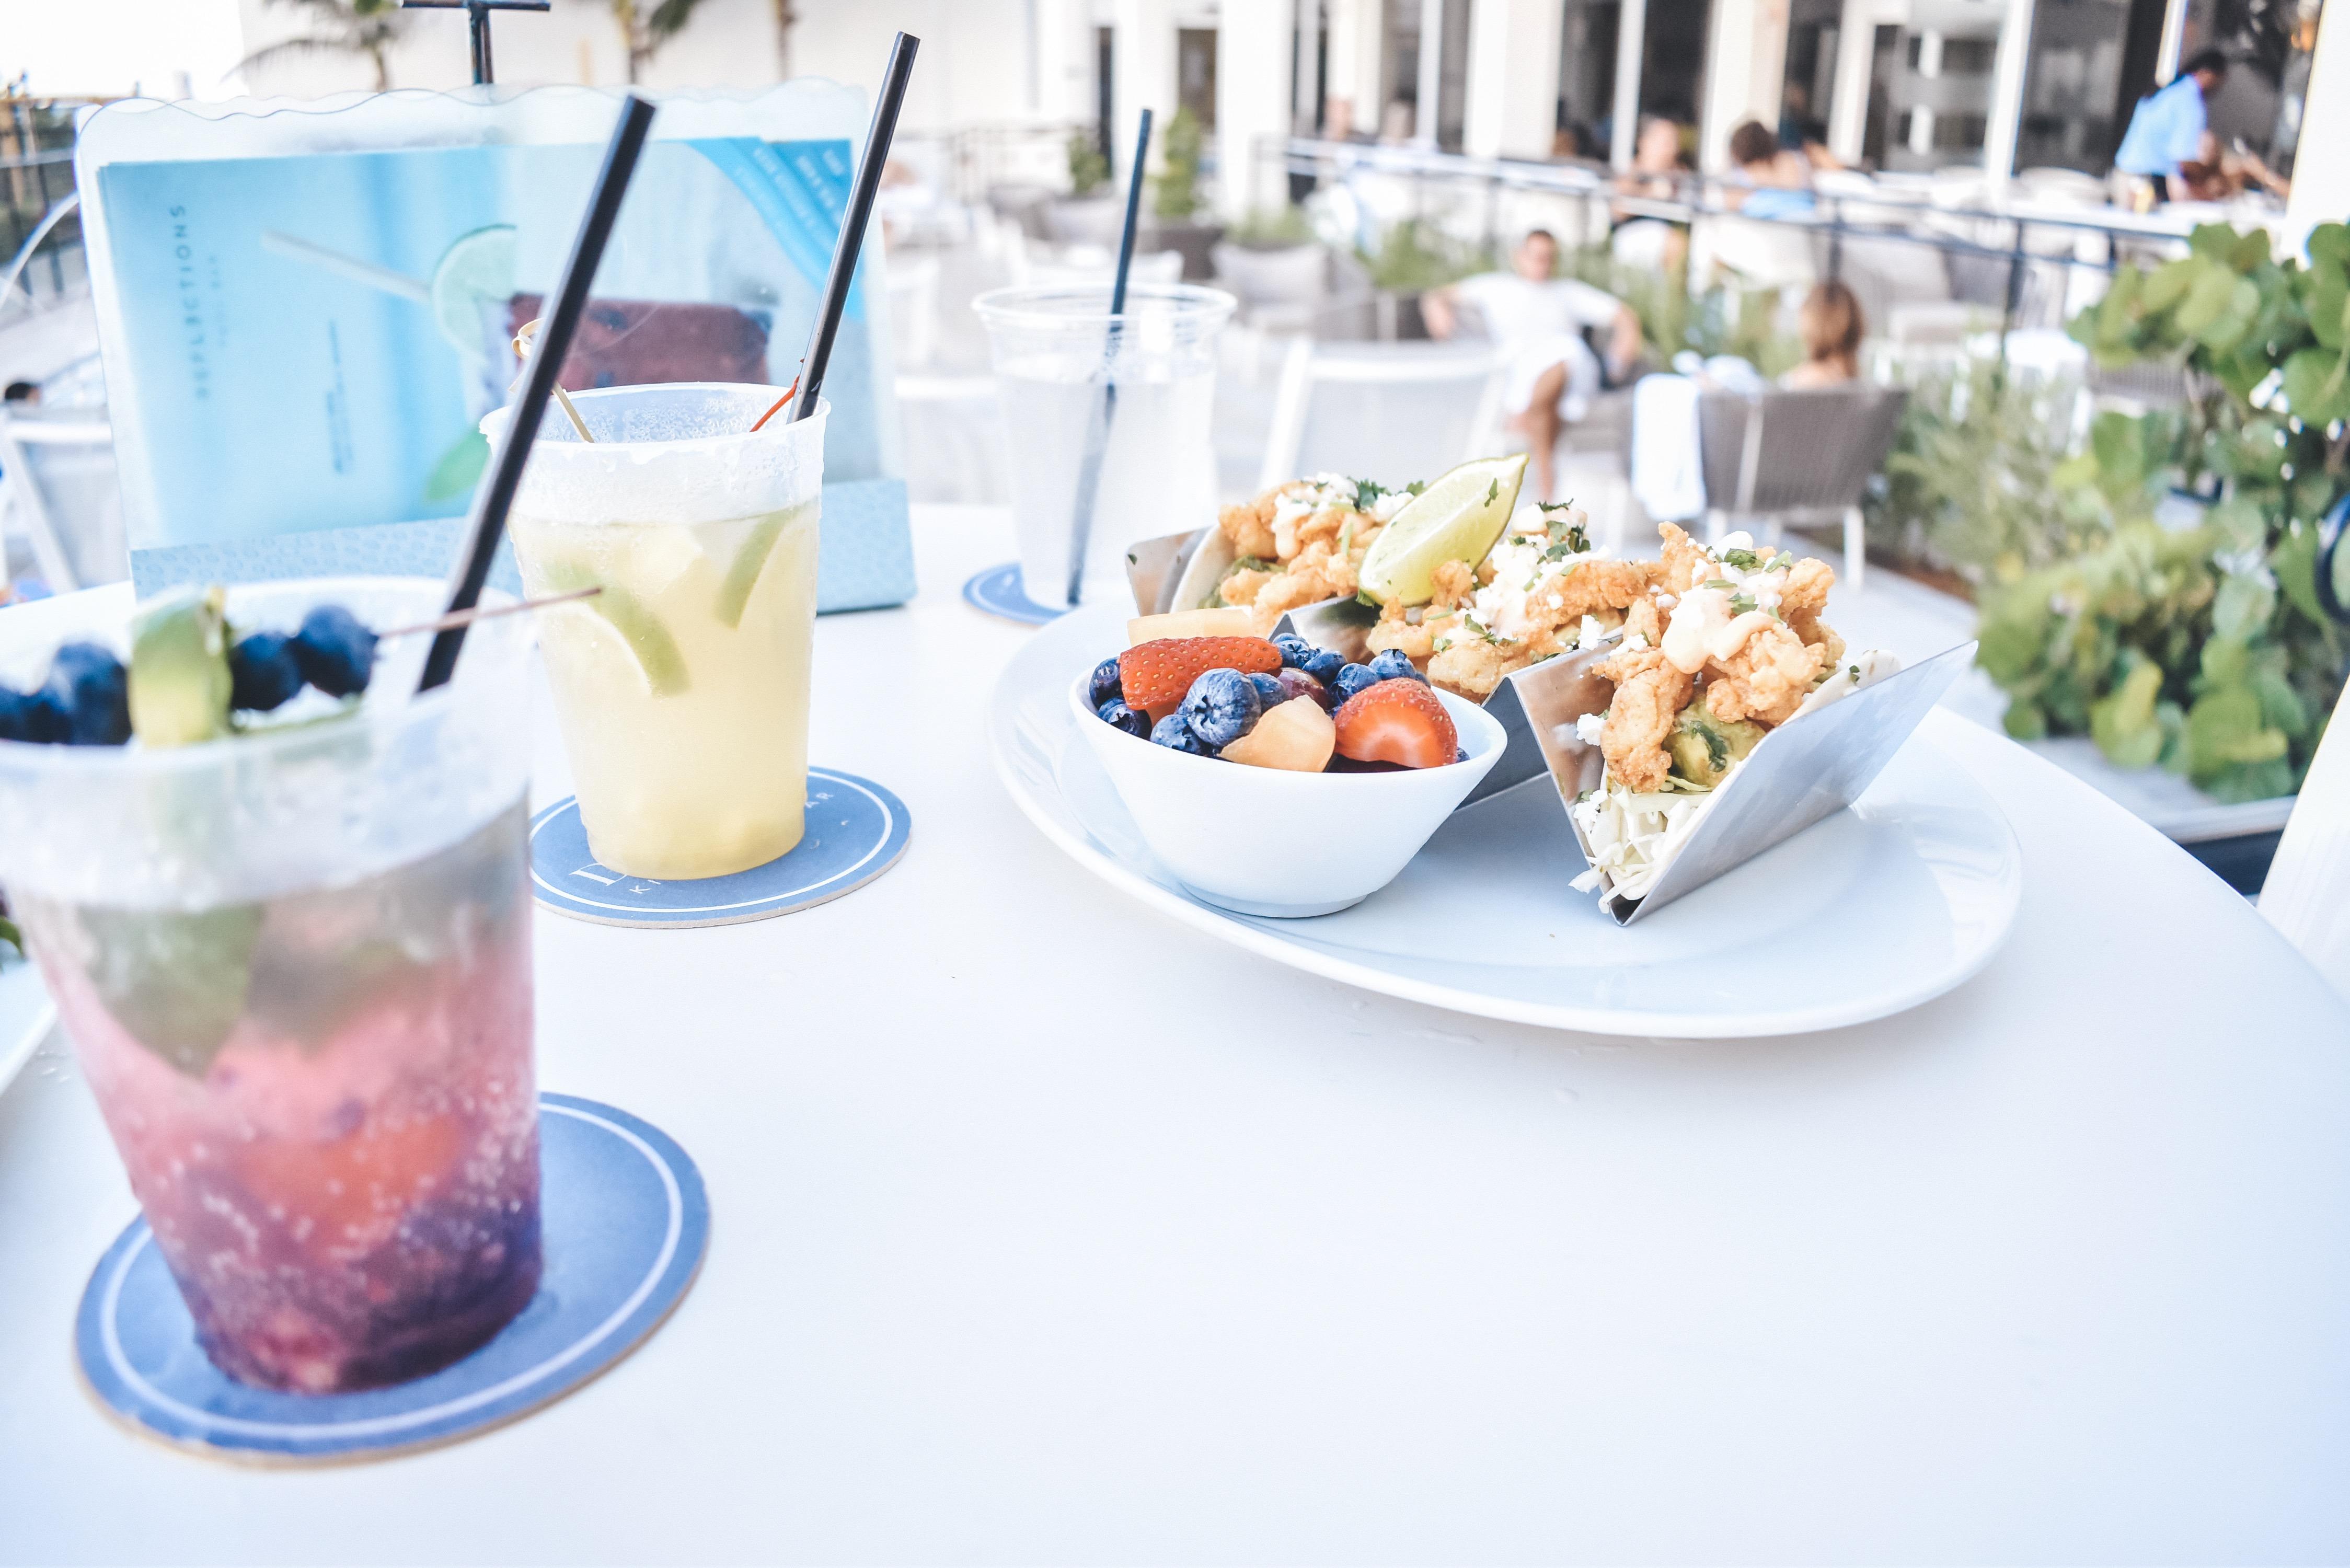 Hutchinson Shores - 30A Mama Travel - Shrimp Tacos and Cocktails at Drift